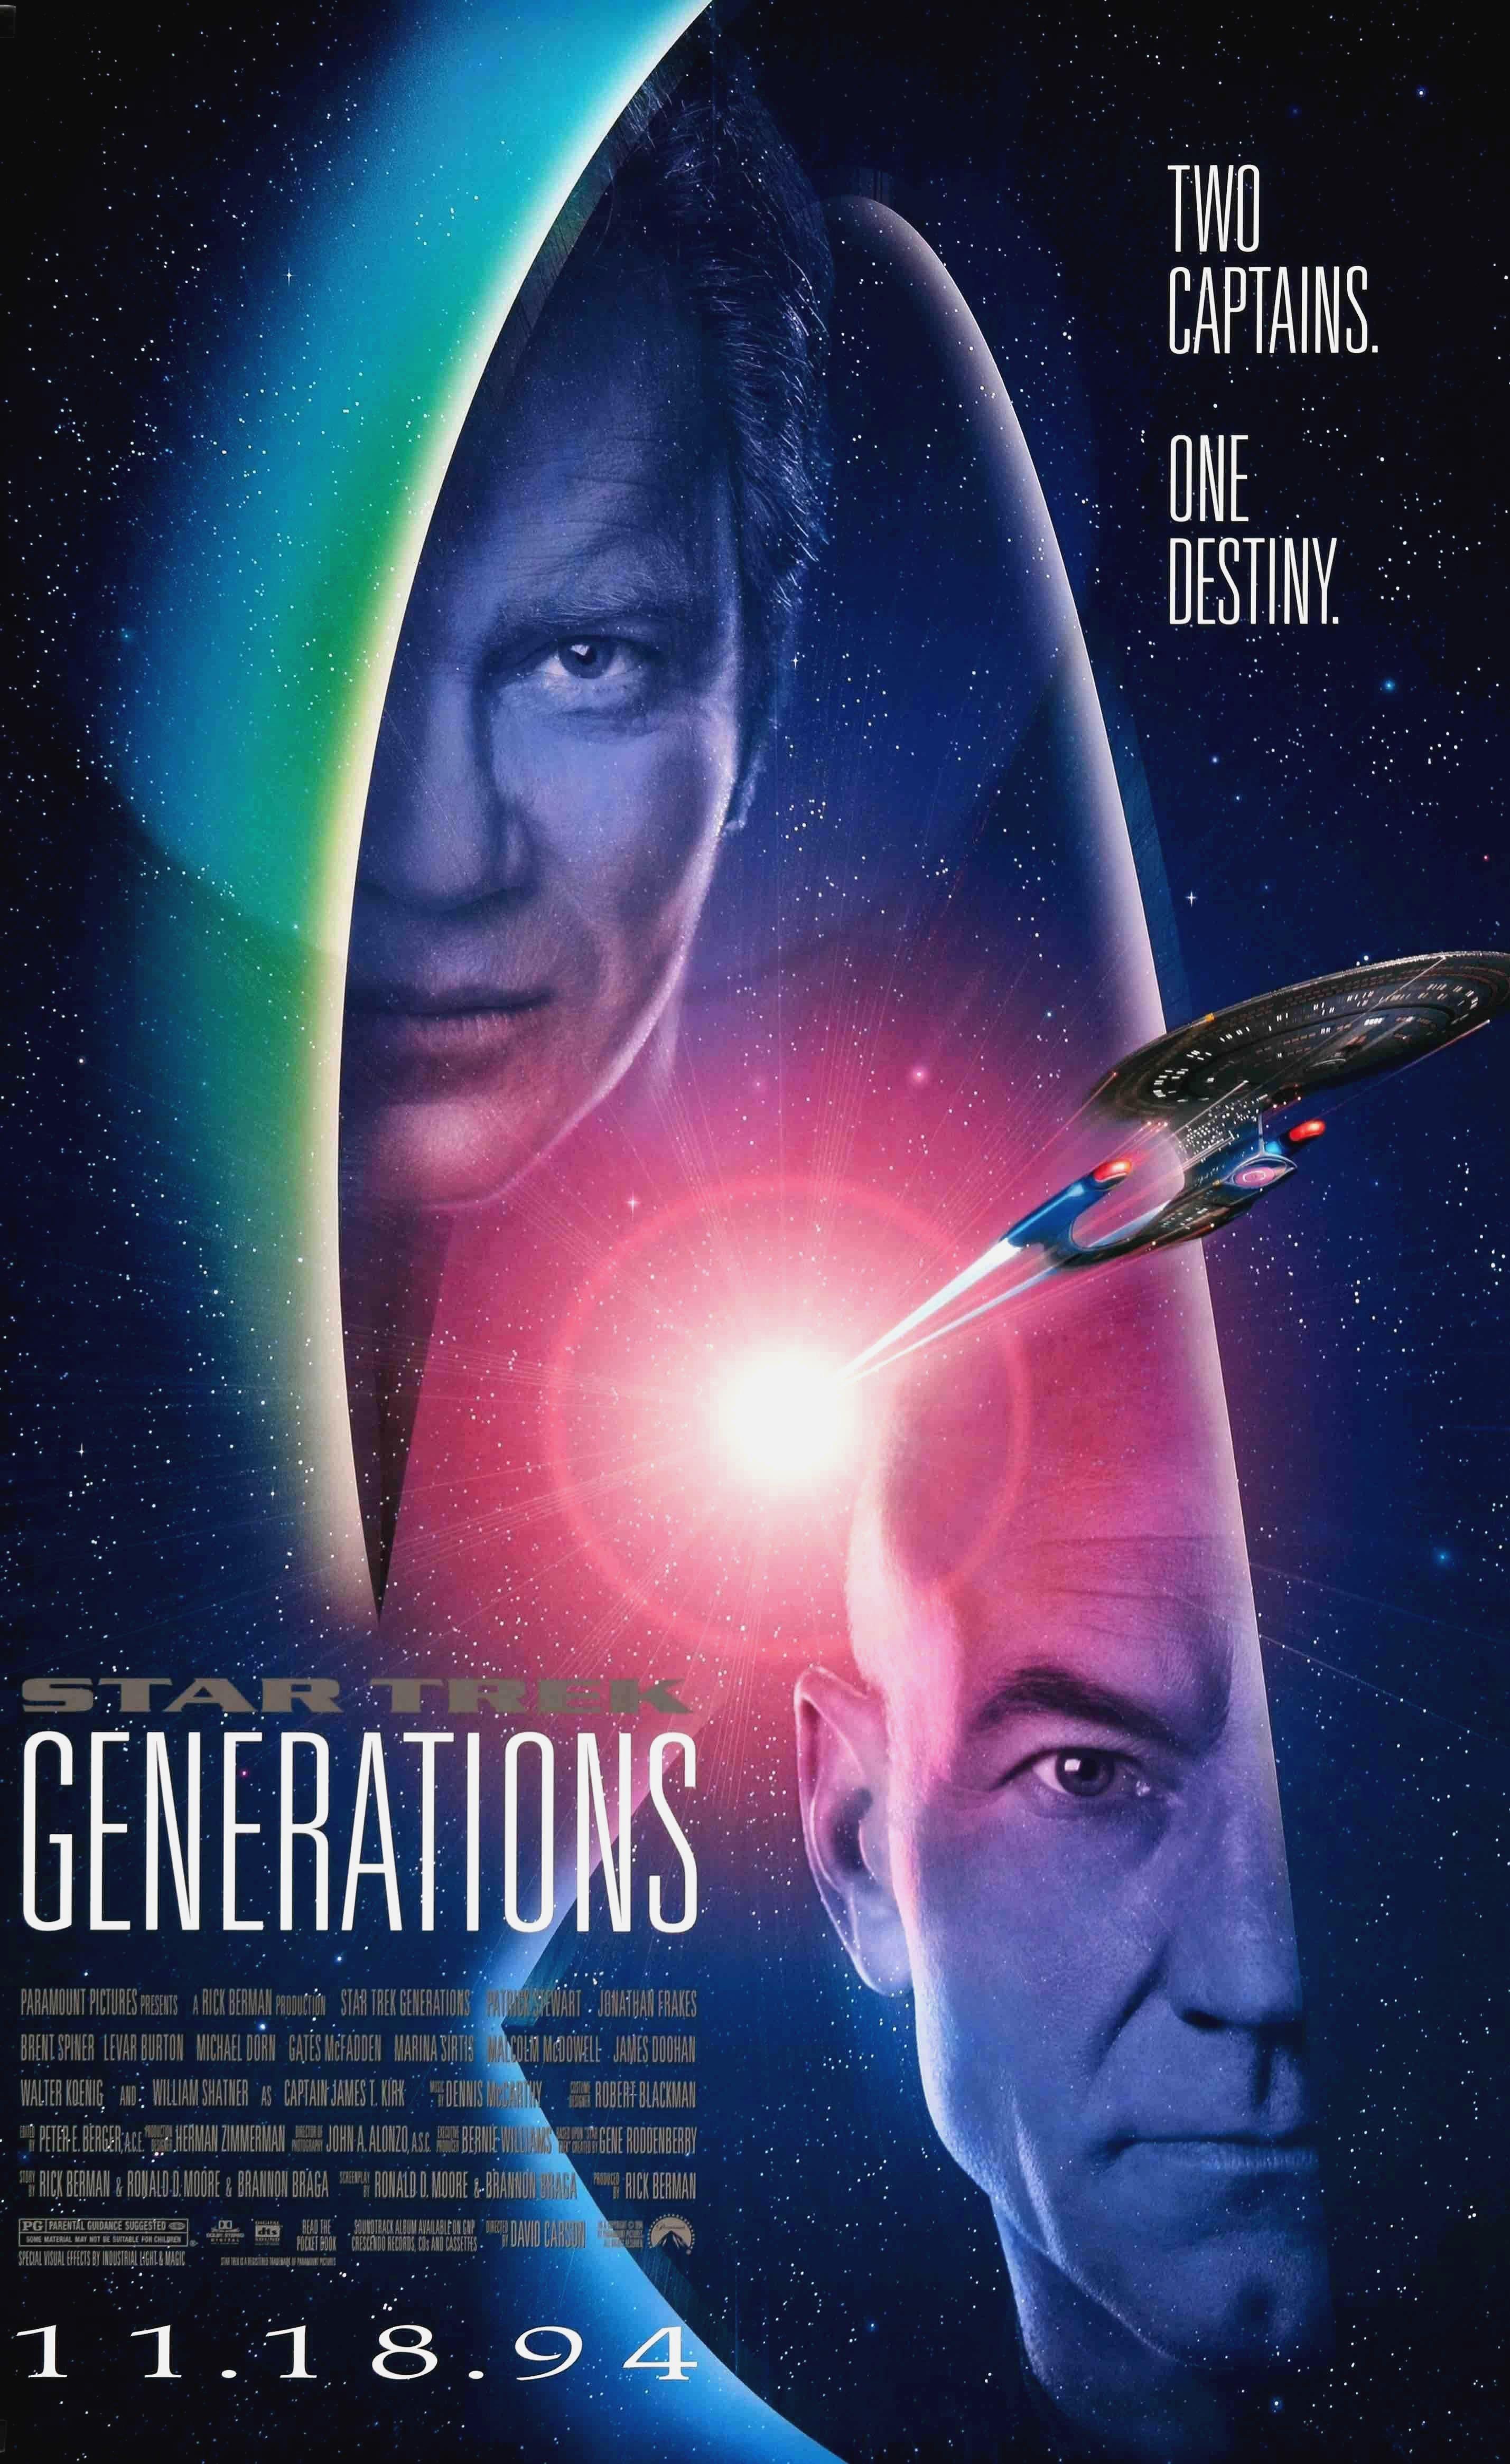 Star Trek: Discovery Season 3- Will it be released on